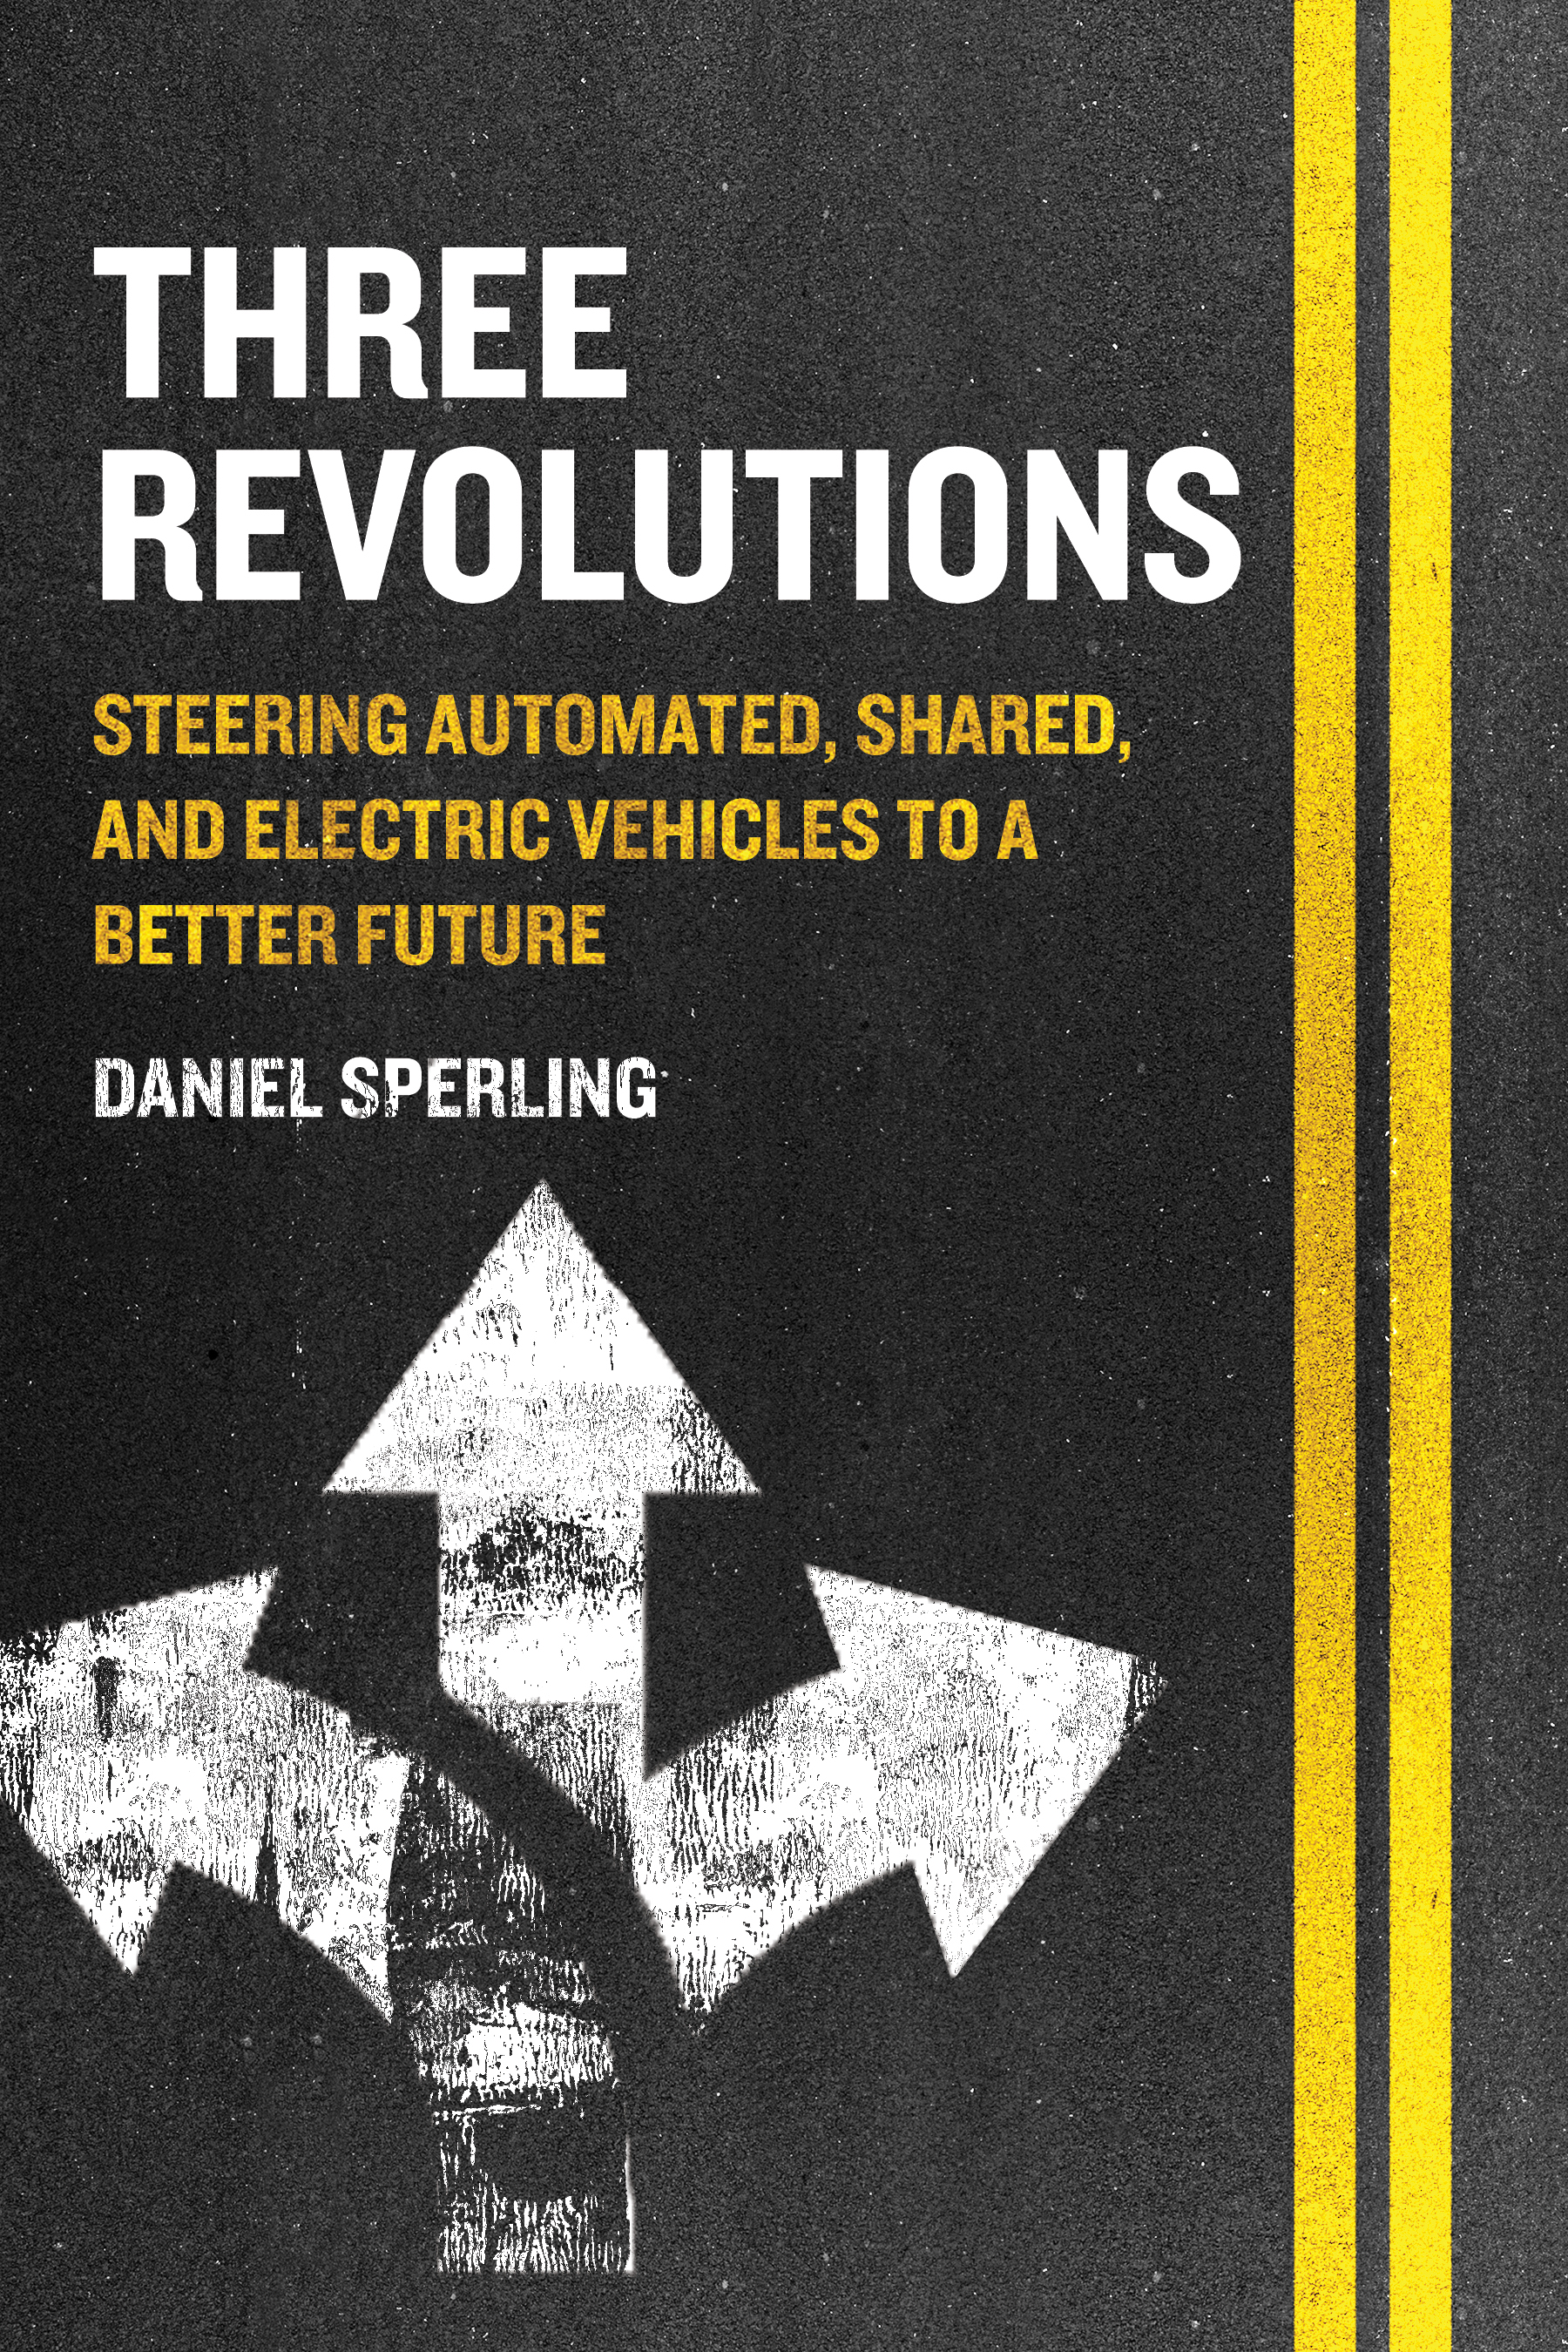 Sperling's latest book - Three Revolutions